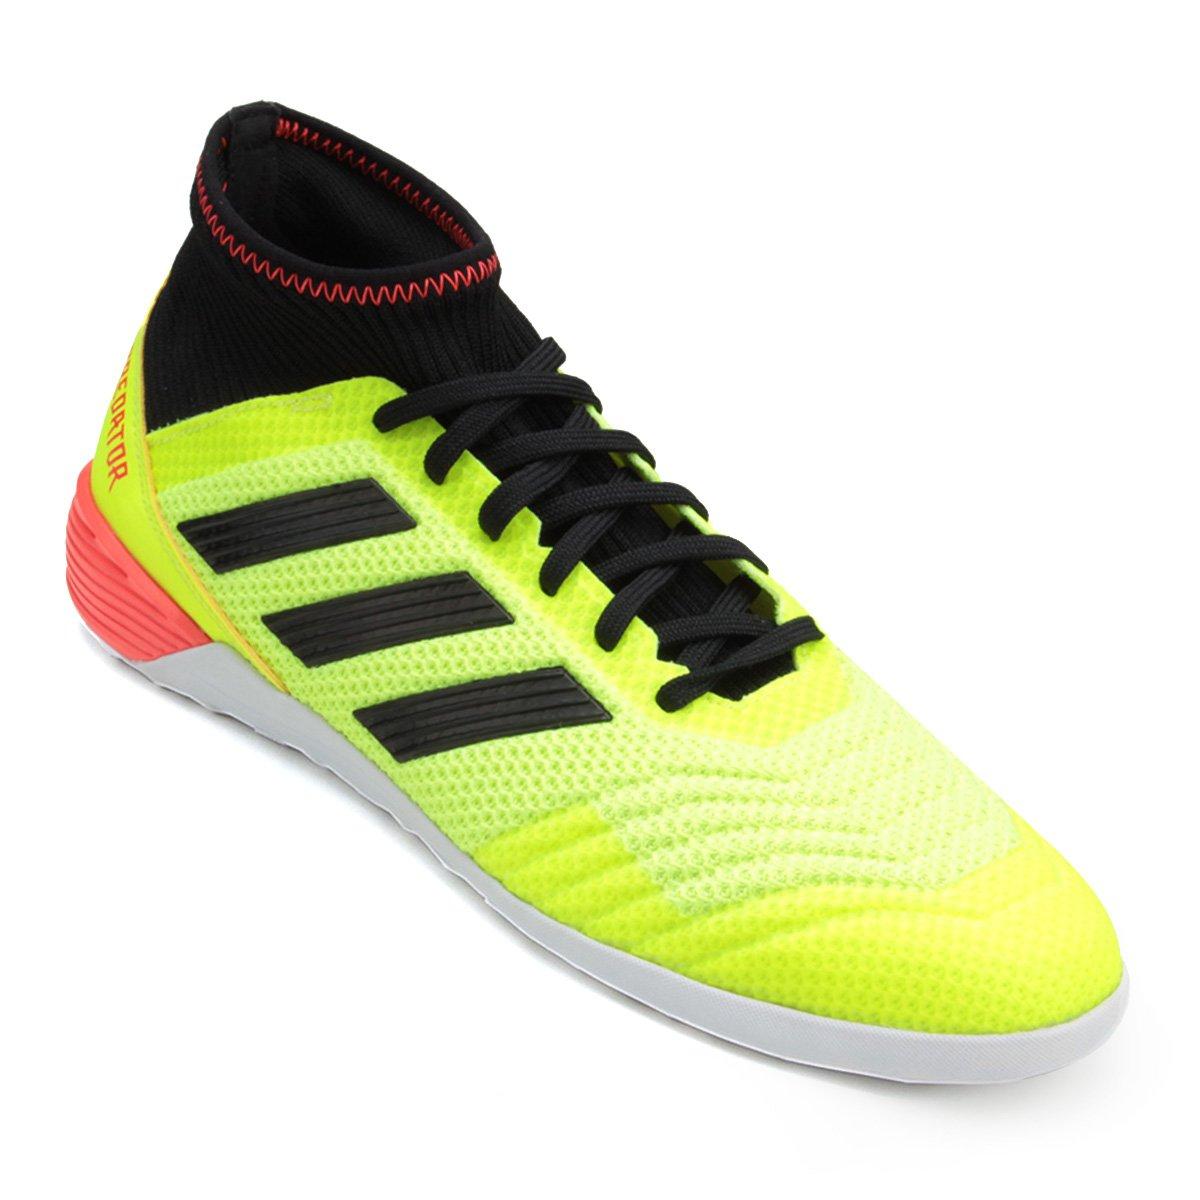 b0d10a6aab Chuteira Futsal Adidas Predator Tan 18 3 IN - Compre Agora